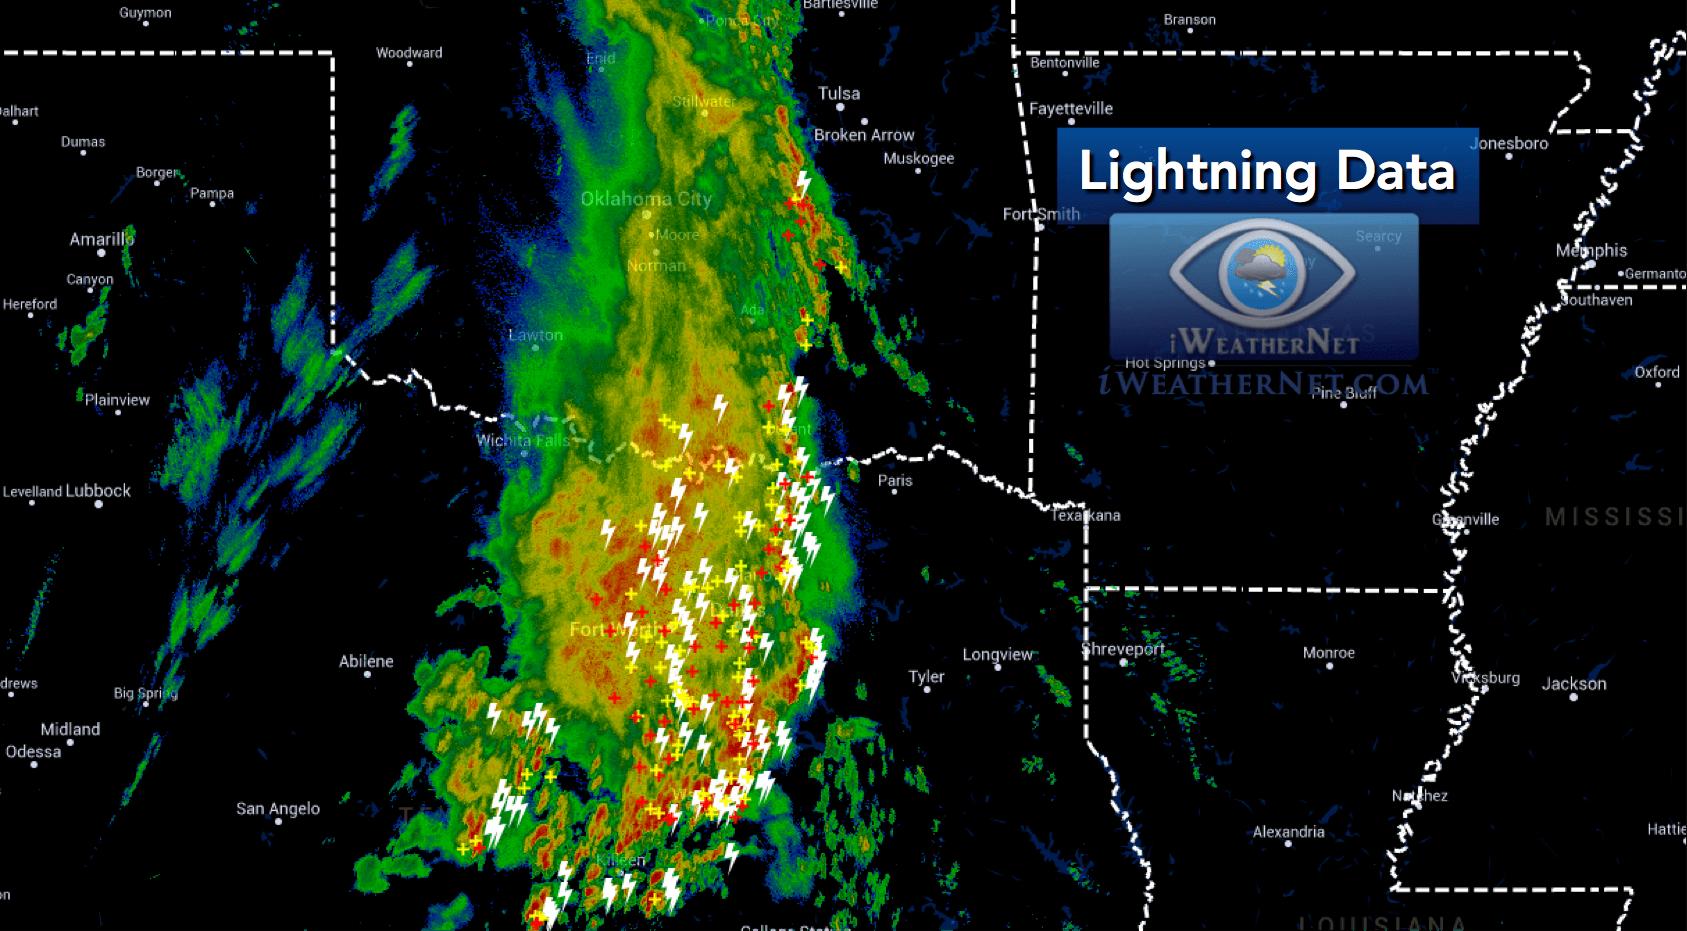 Current Lightning Data Realtime Strikes iWeatherNet